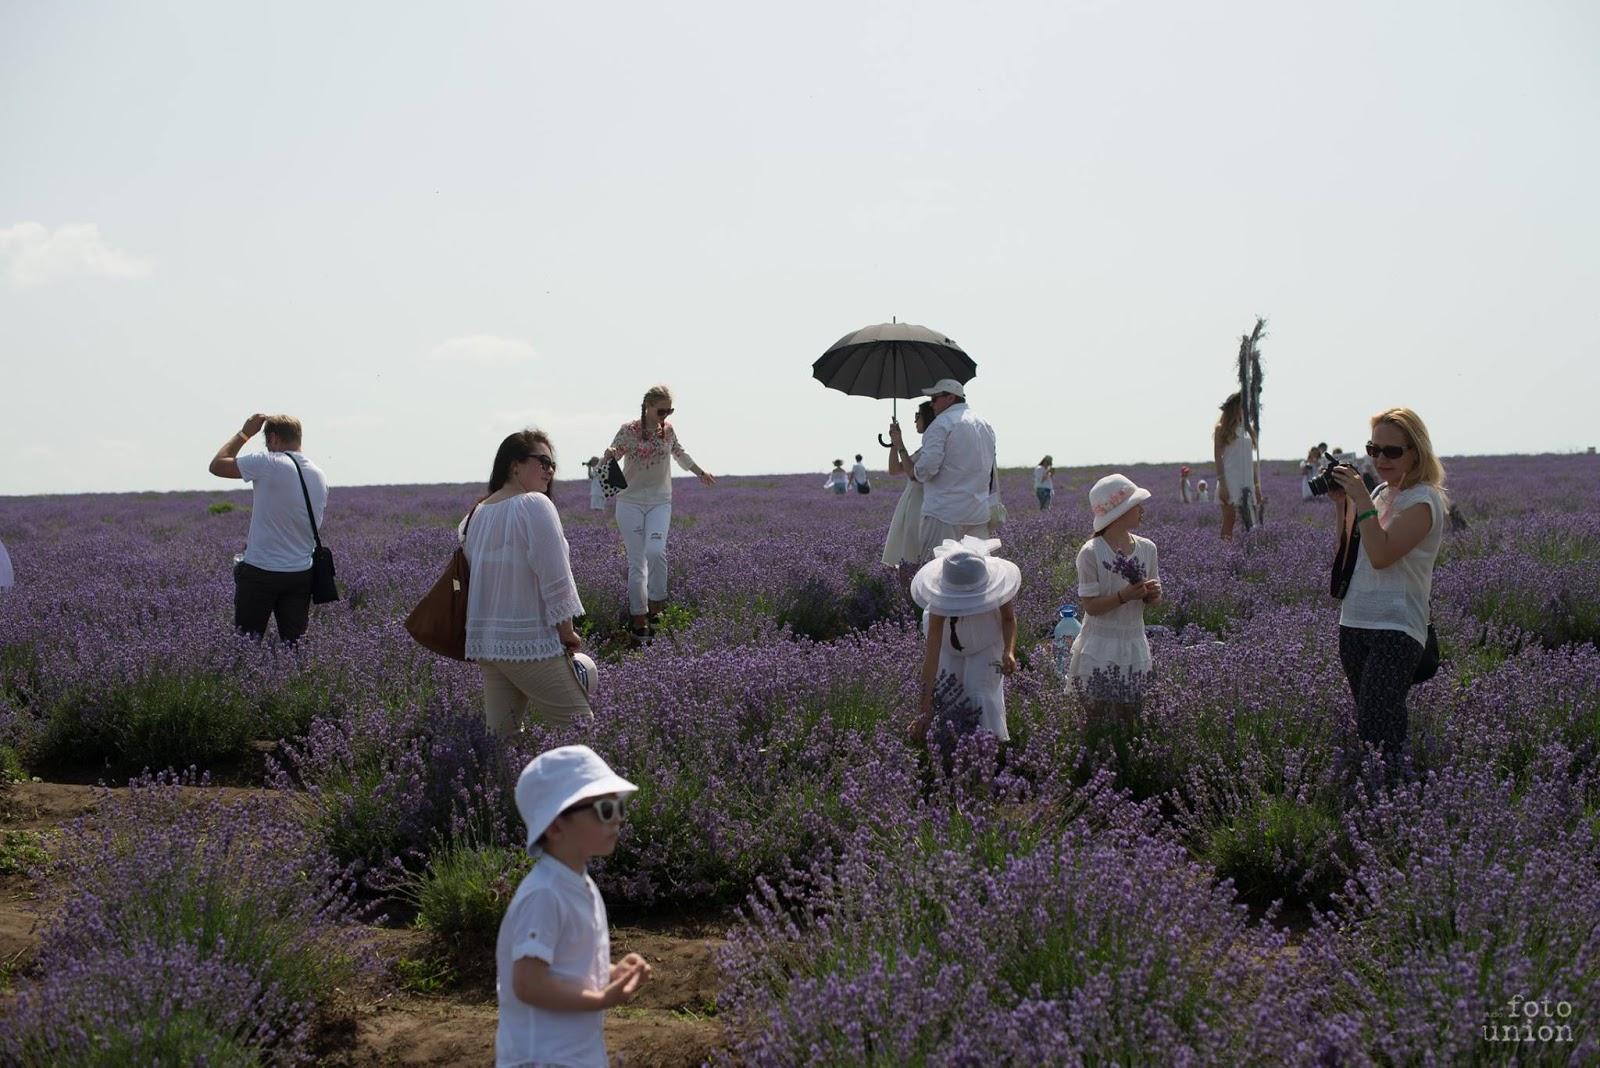 lavender%2Bfest%2B2016%2Bmihaela%2Bjosanu.jpg